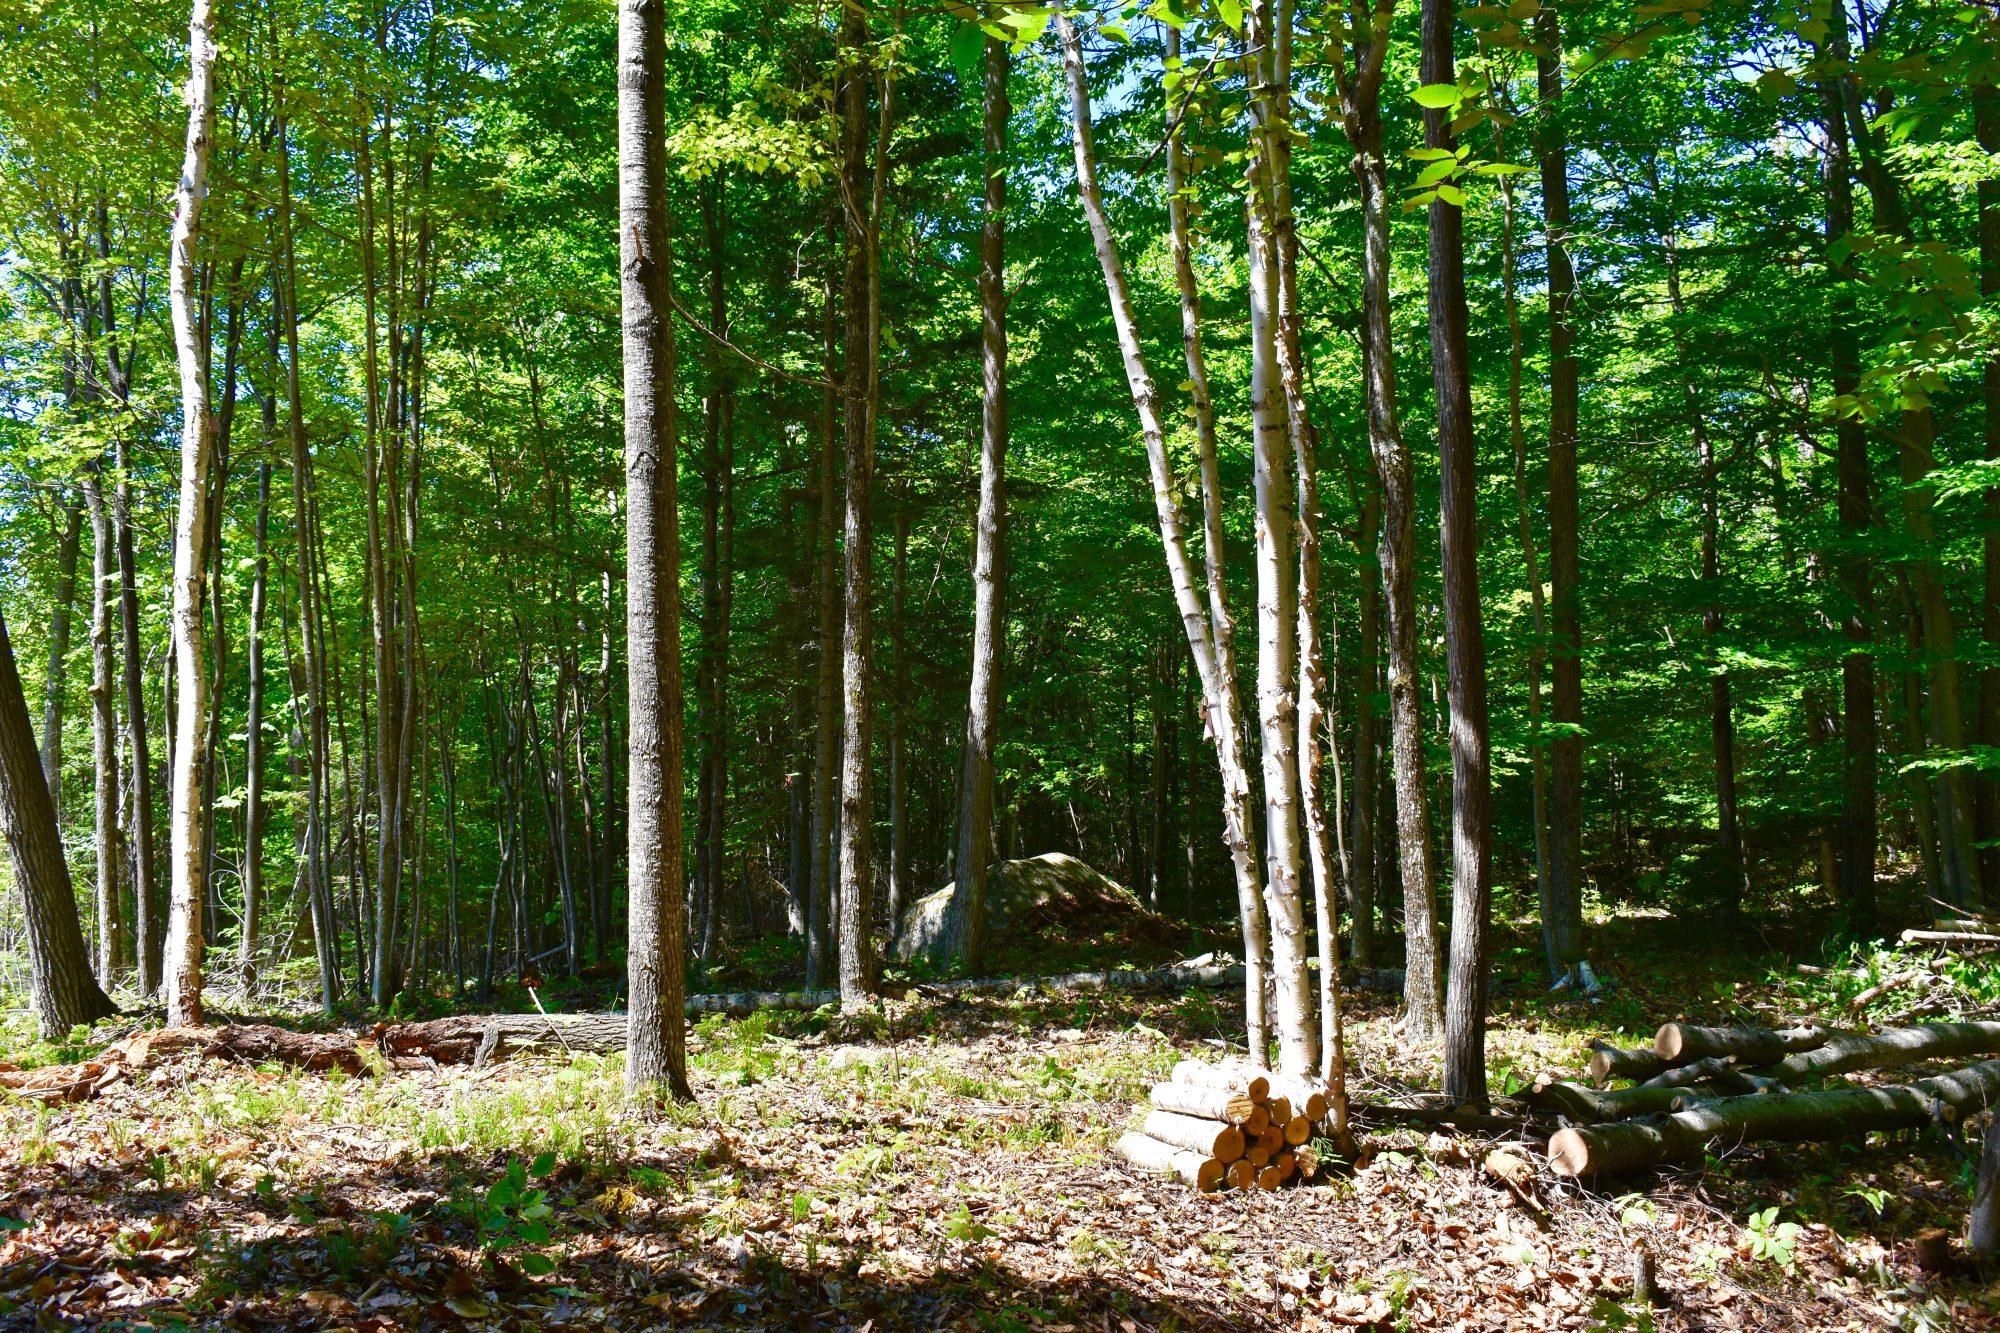 Woods nice